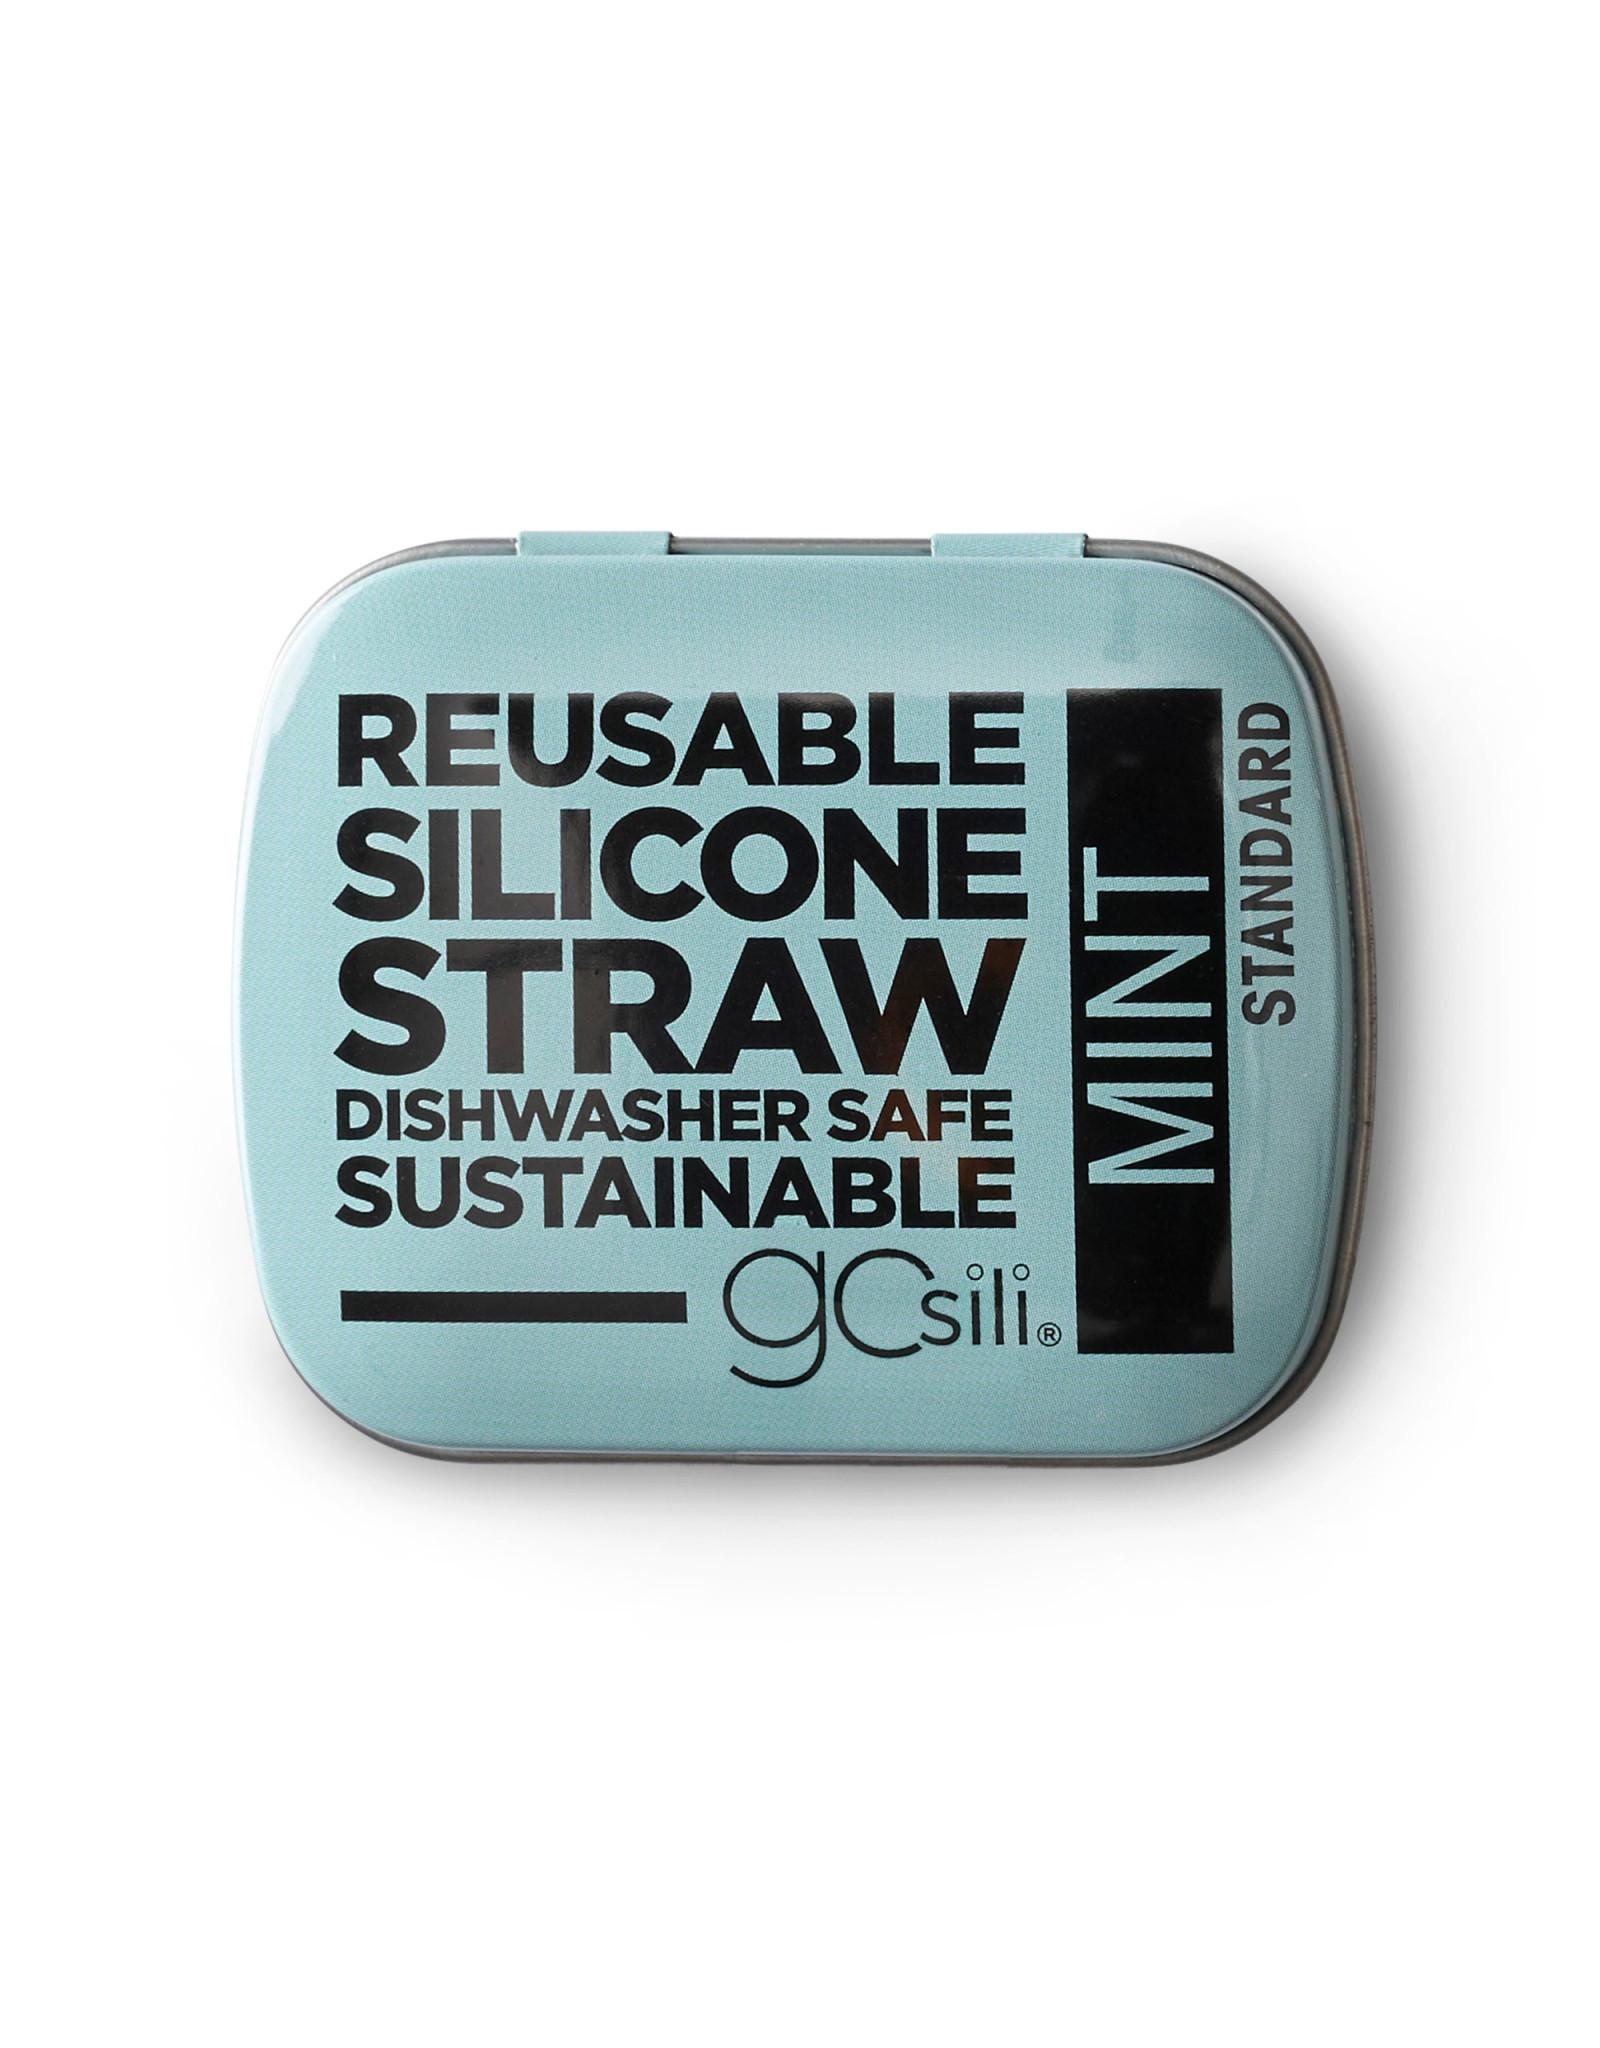 Go sili Reusable silicone straw in tin